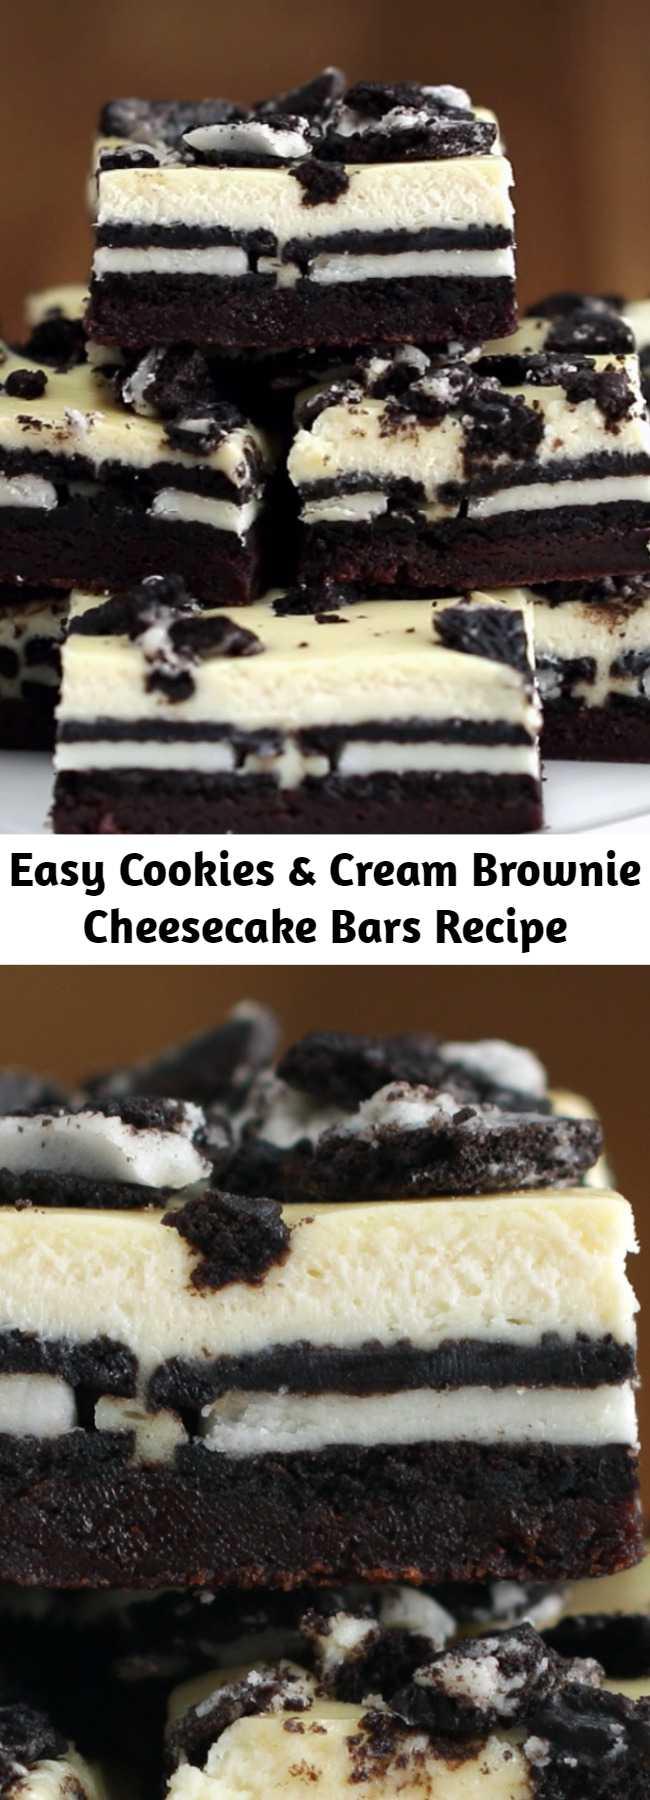 Easy Cookies & Cream Brownie Cheesecake Bars Recipe - Easy af and big crowd pleaser!